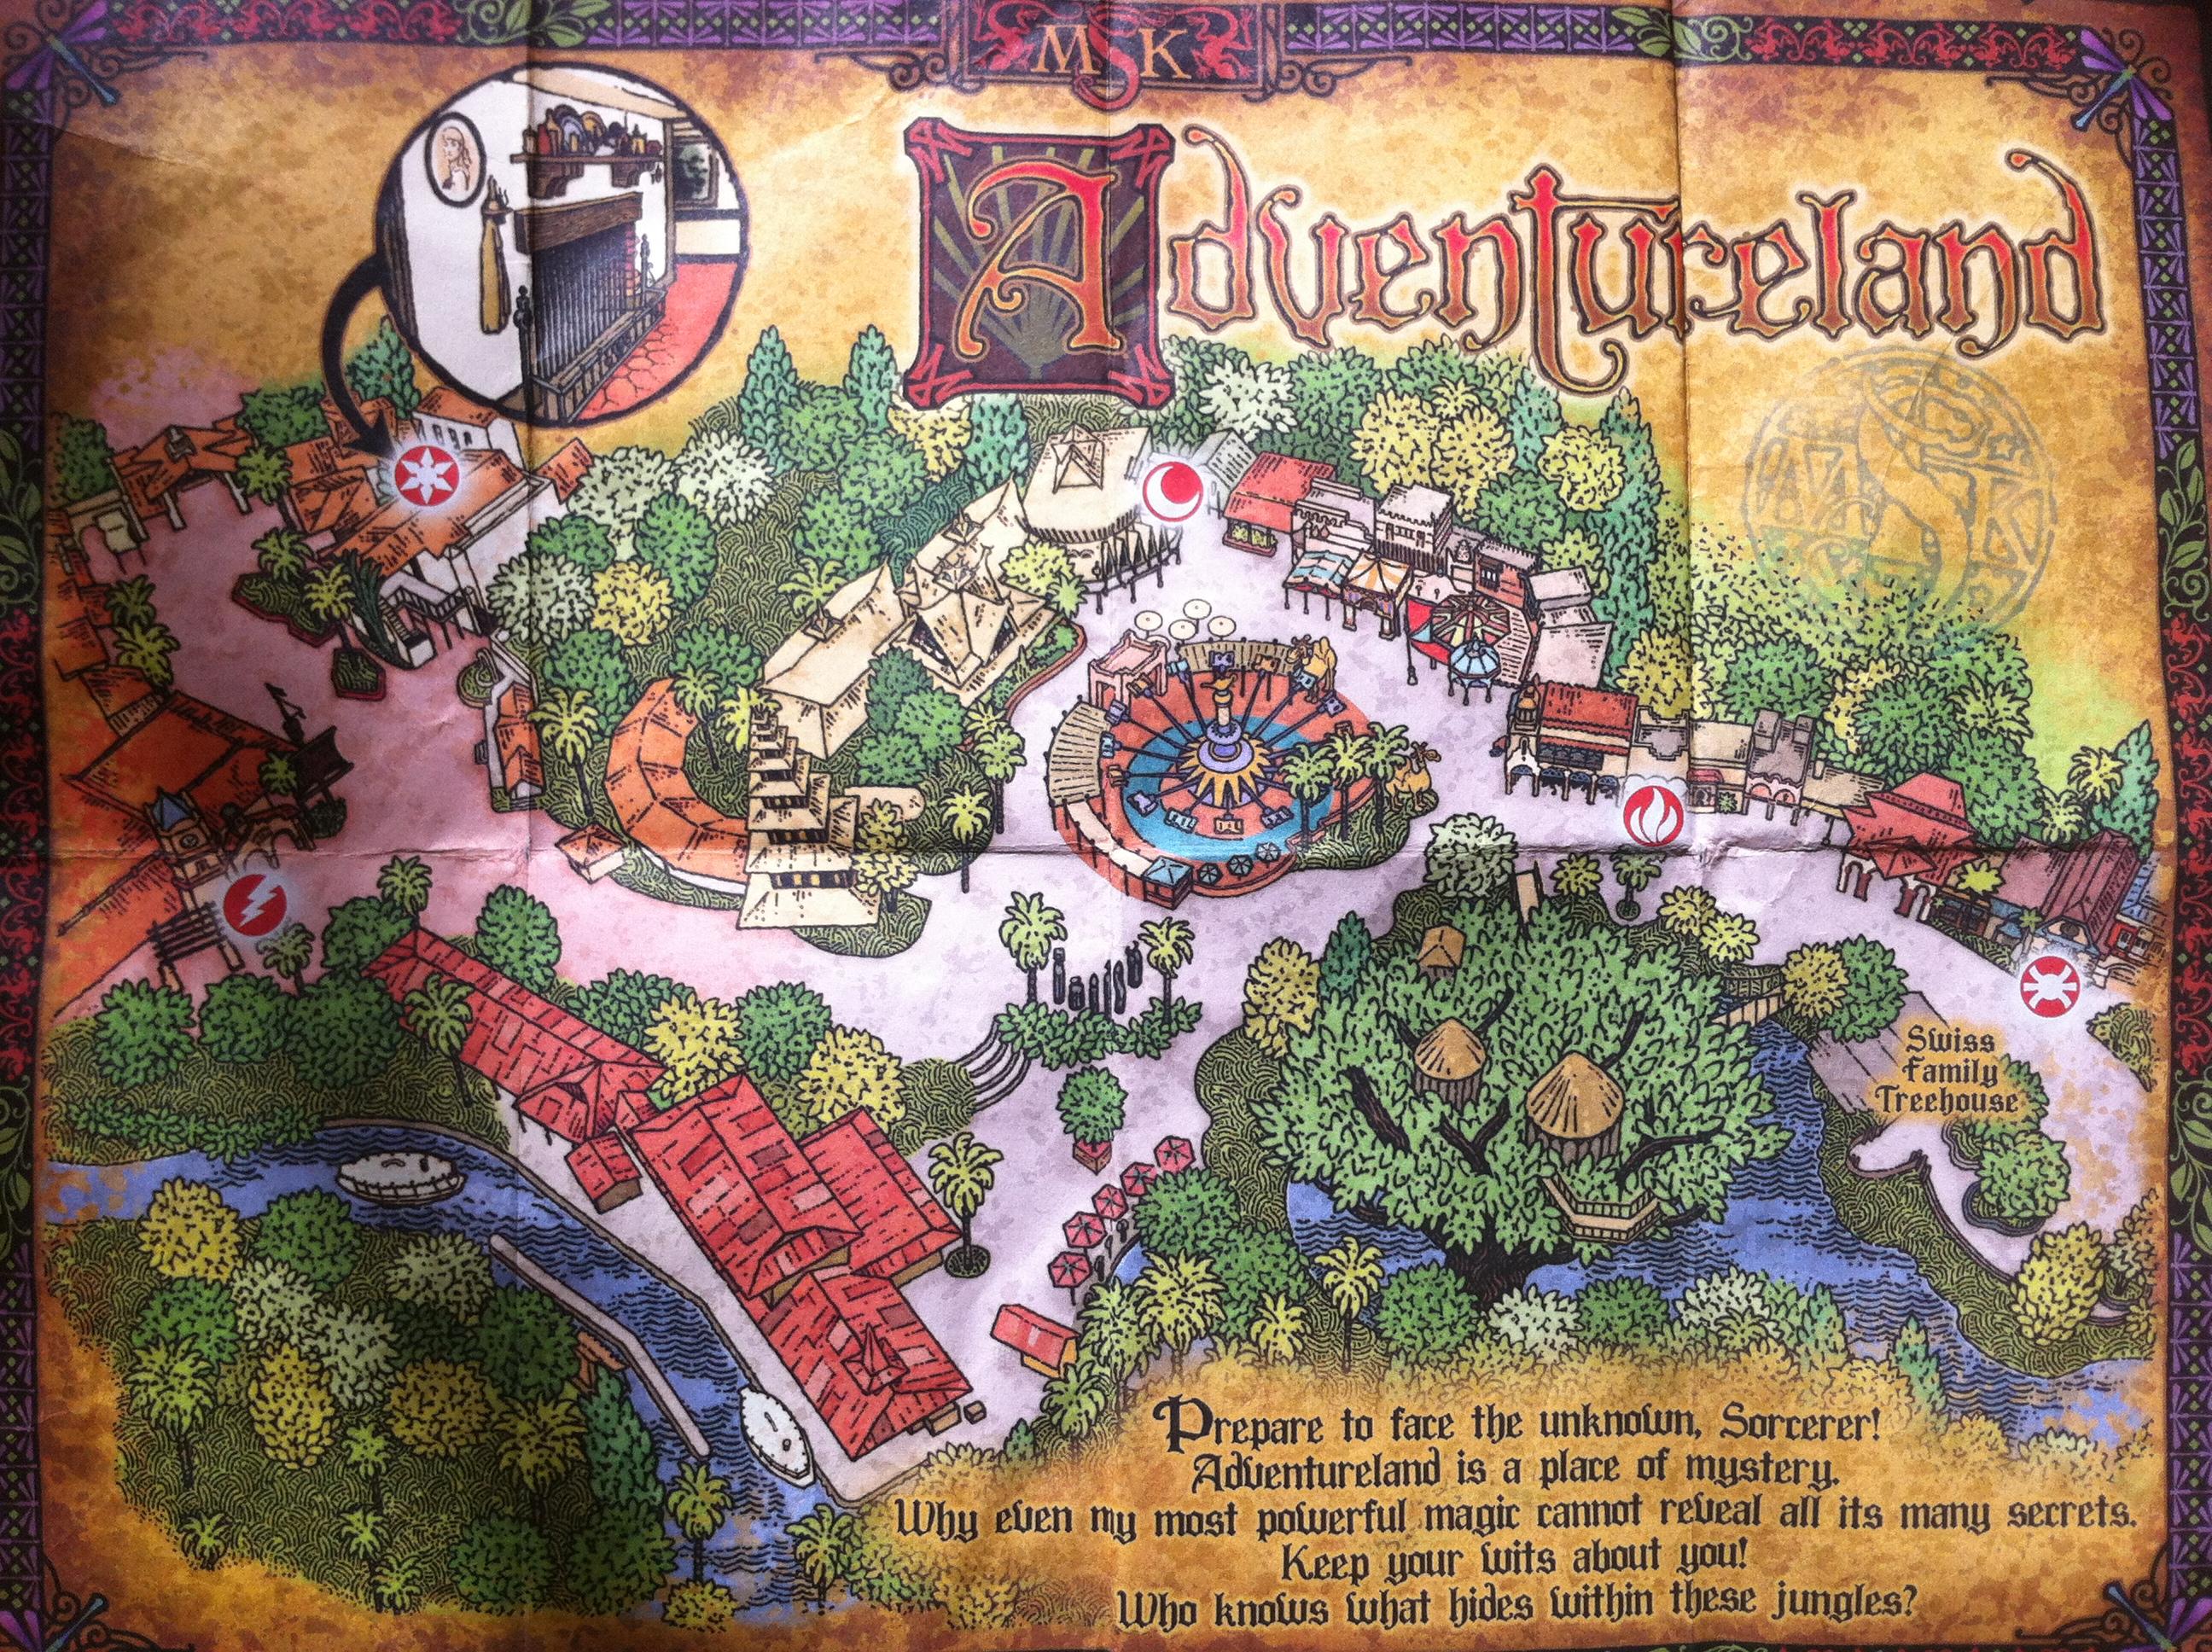 Magic Kingdom Adventureland Map 2013 Sorcerers of the magic kingdom